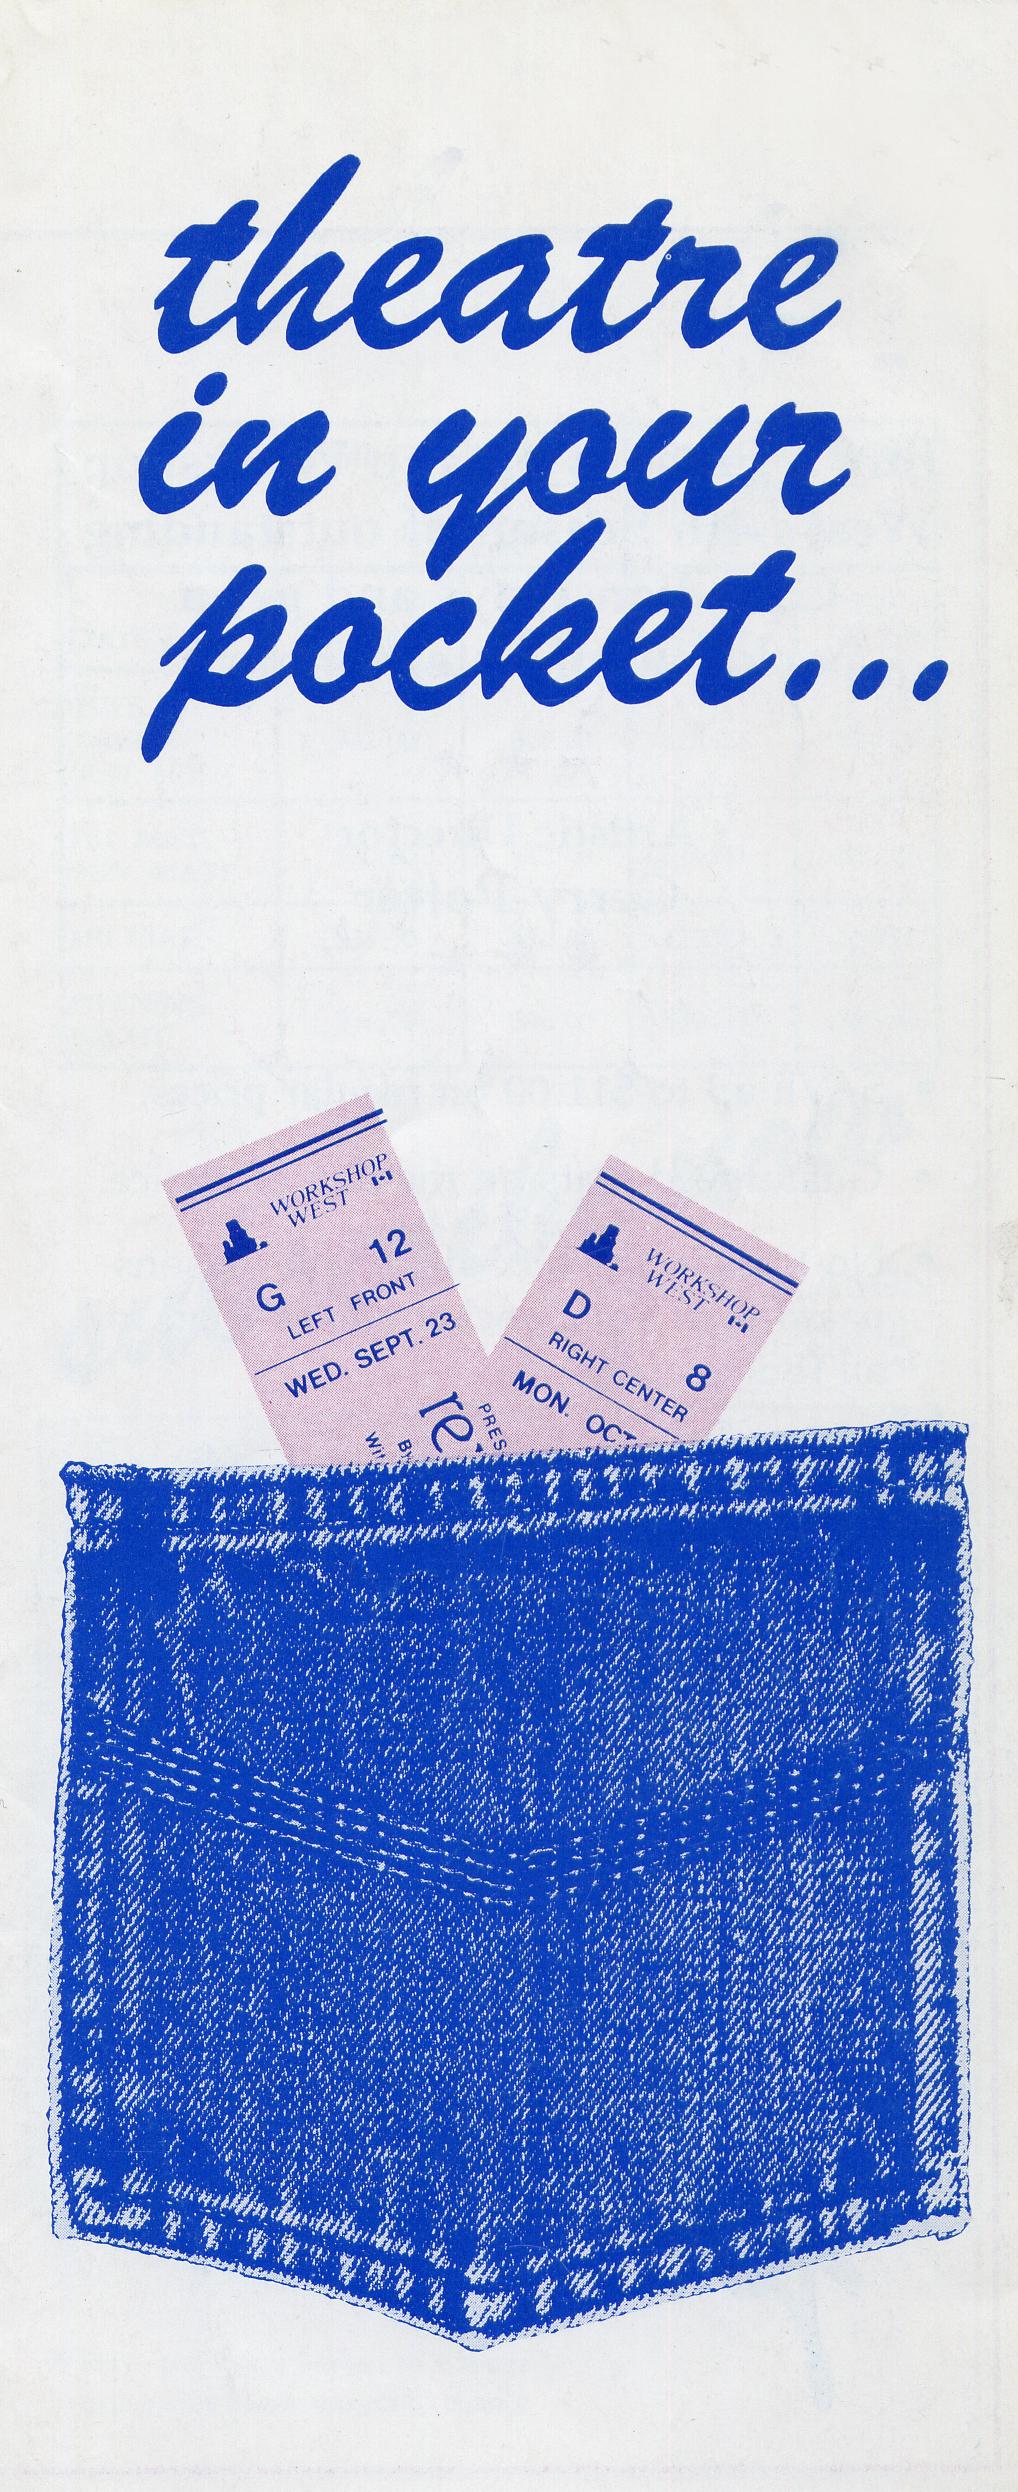 004-02. 81-82 SeasonBrochure1.jpg